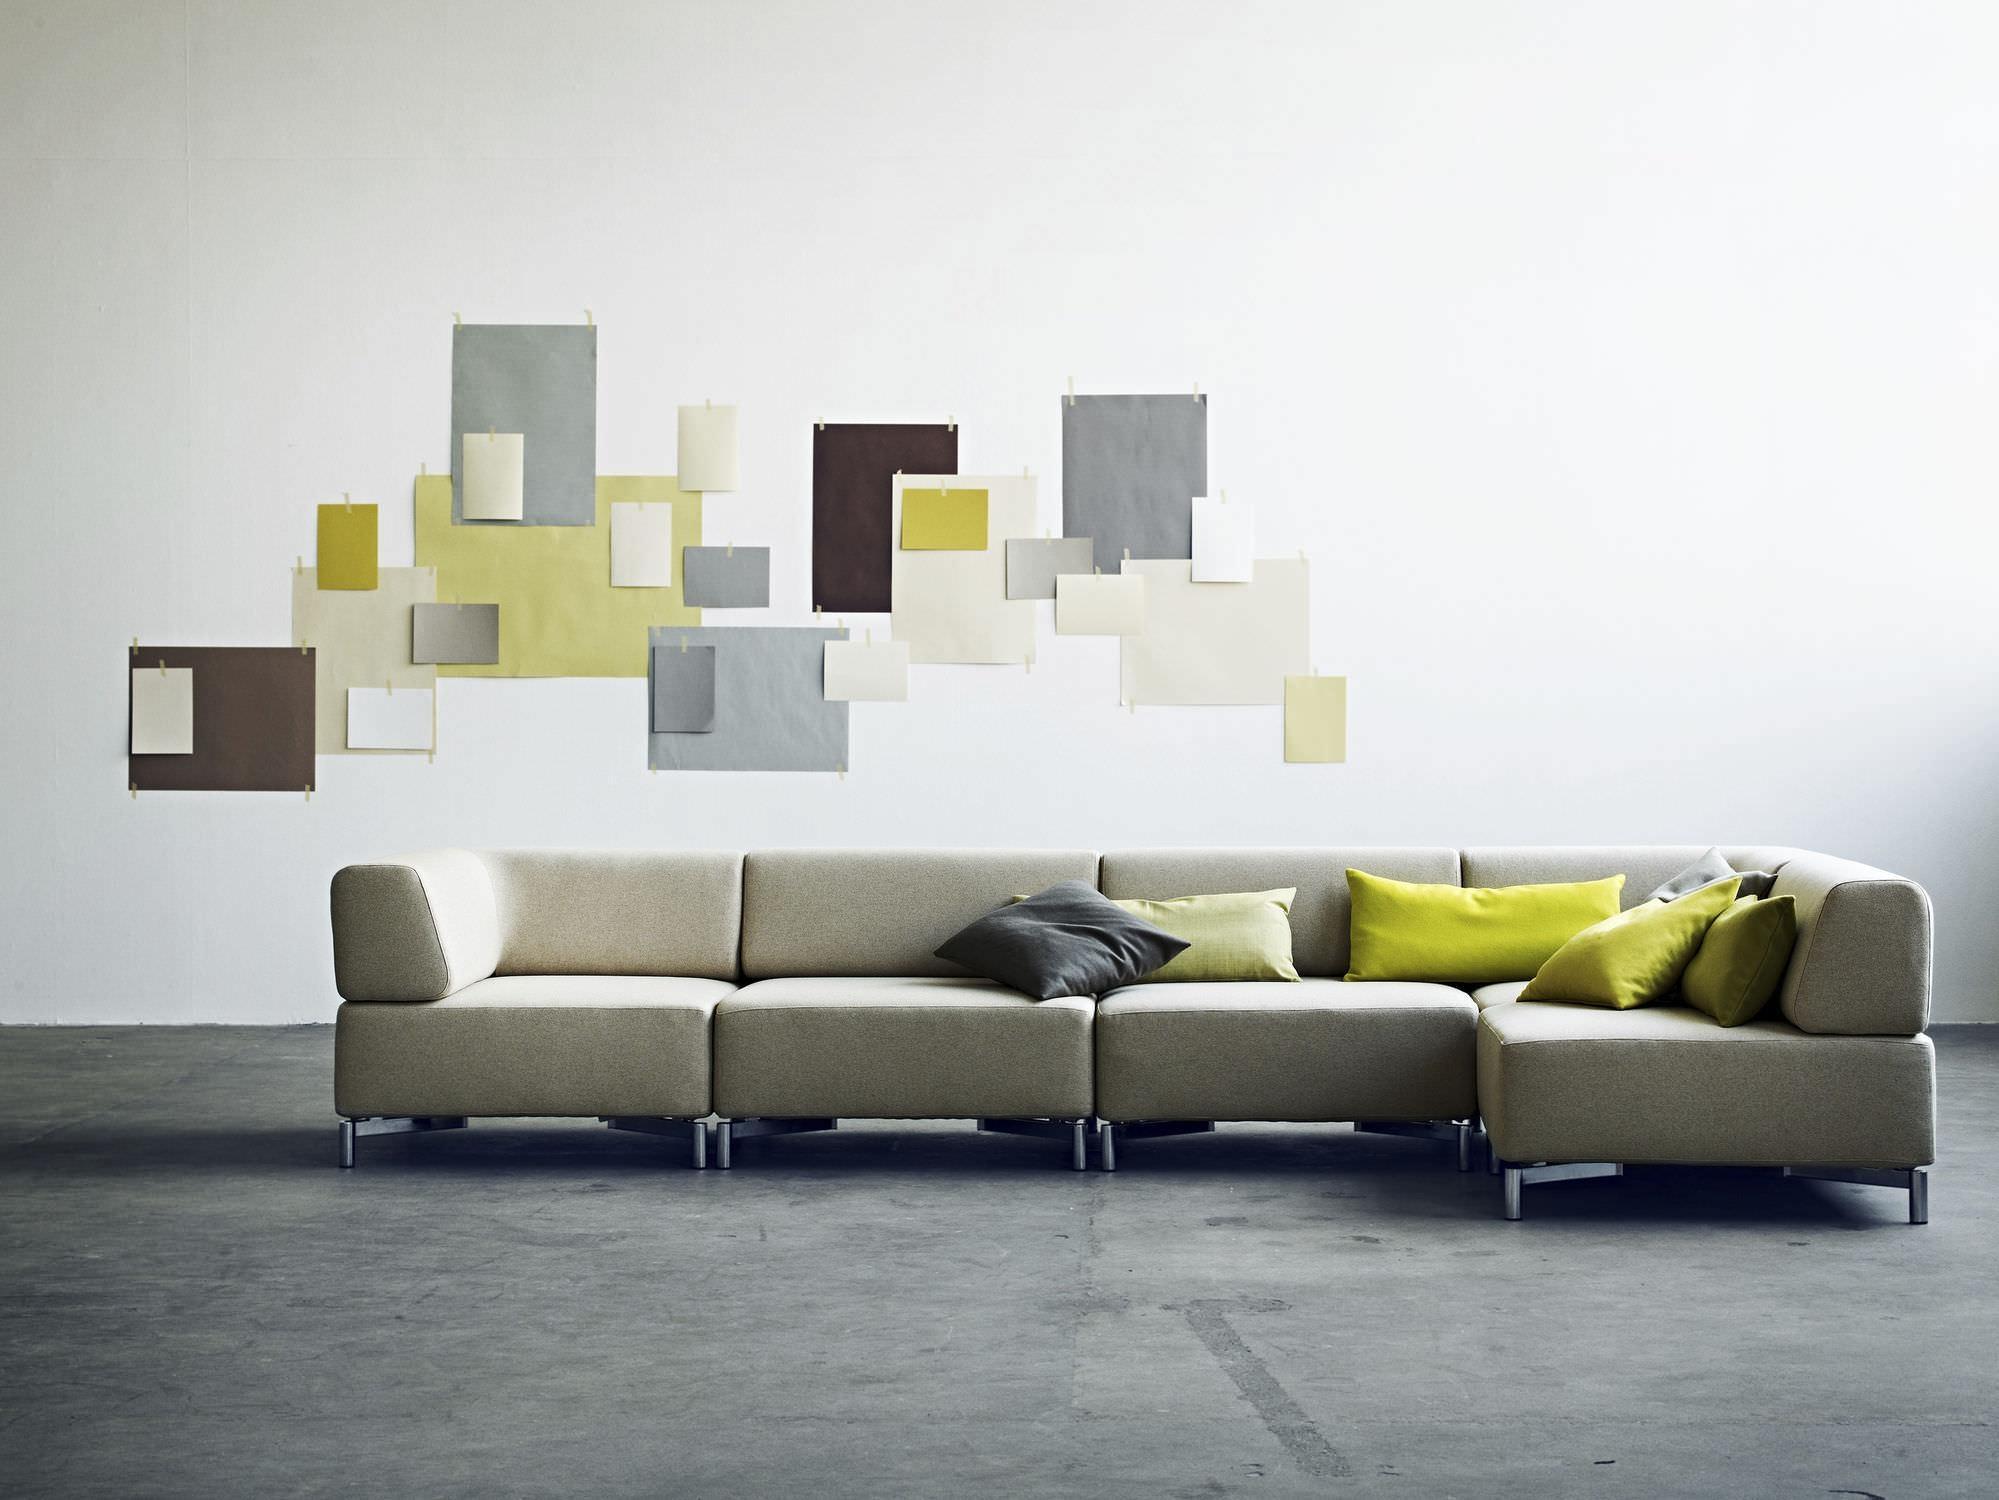 Modular Sofa / Contemporary / Fabric / With Removable Cover Within Sofas With Removable Covers (Image 12 of 20)